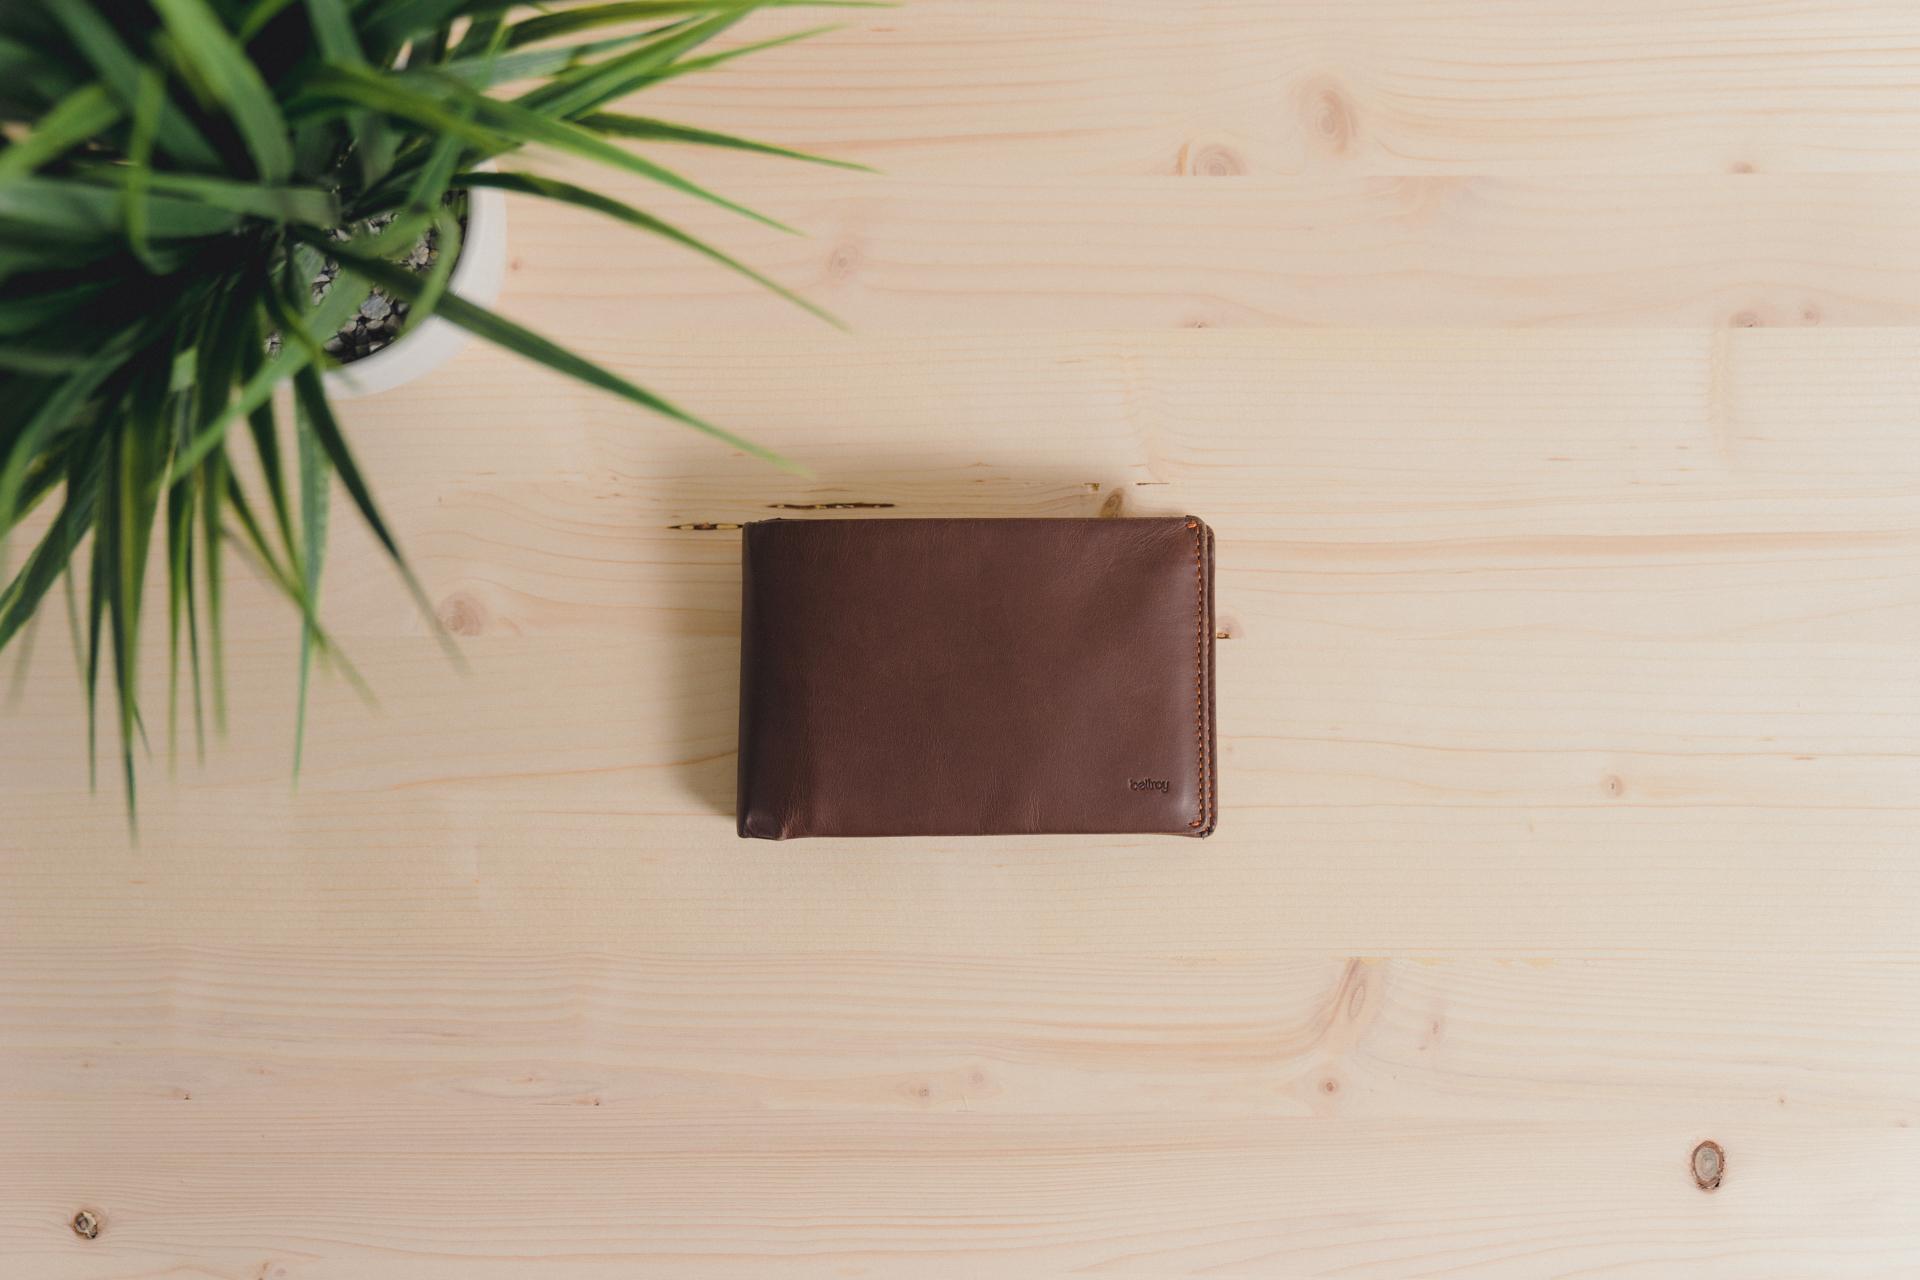 Bellroy-Travel-Wallet-1.jpg